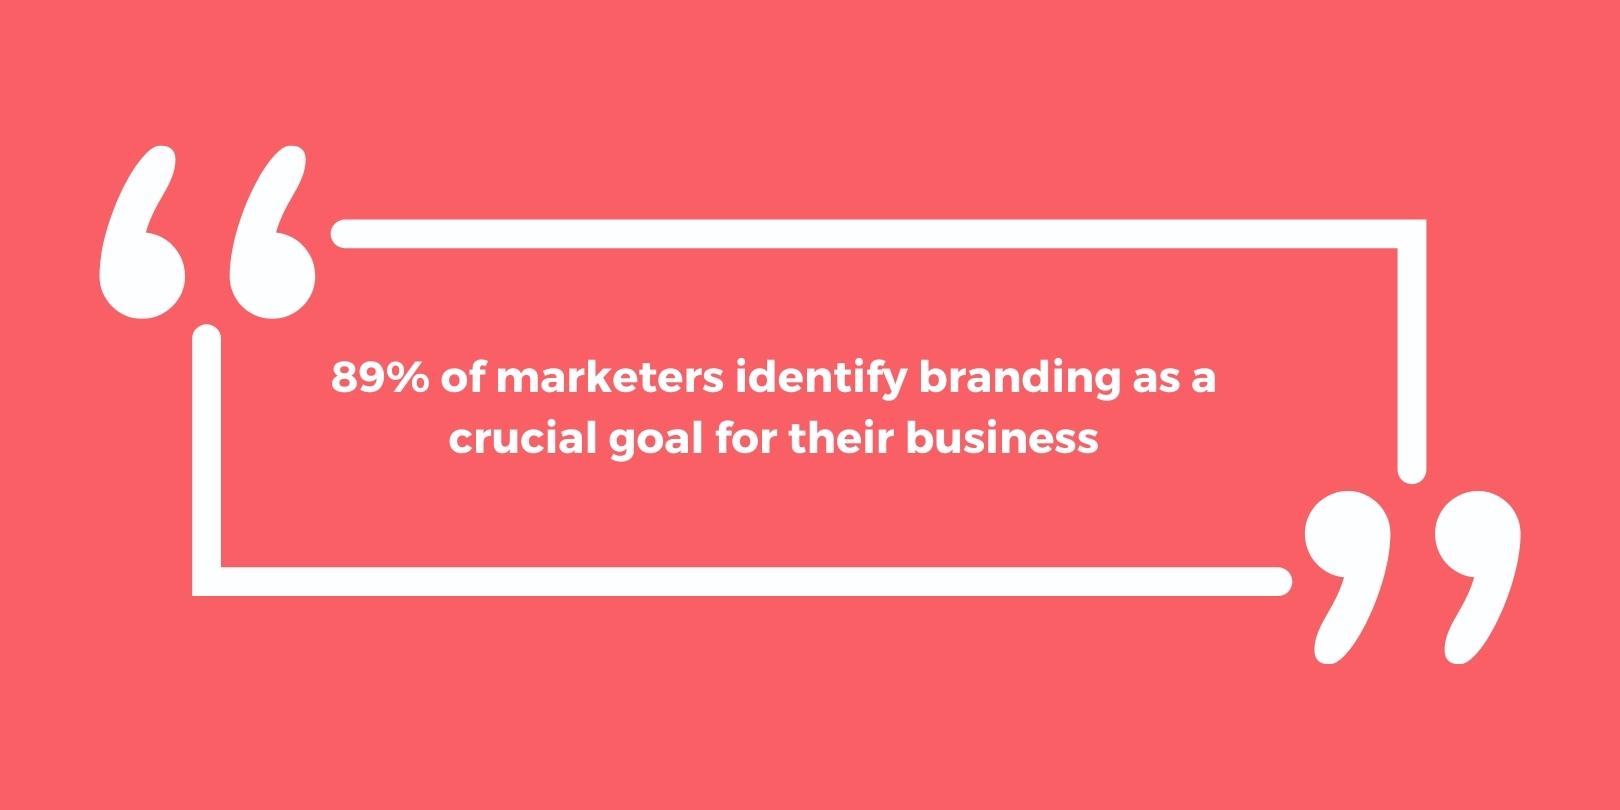 Brand name statistics